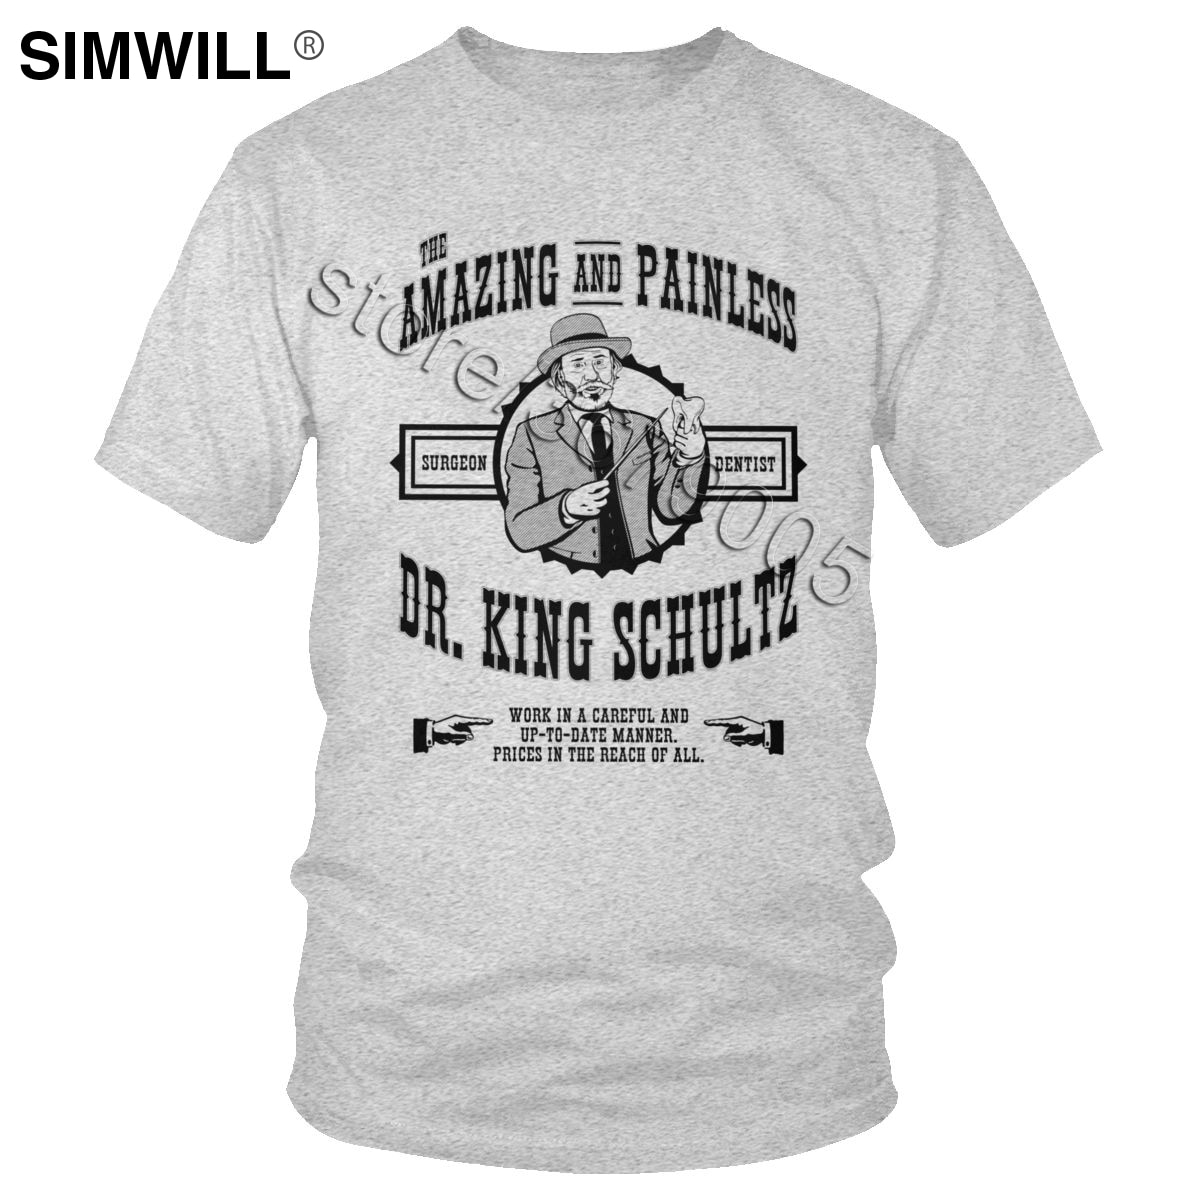 Vintage Dr. King Shultz Camiseta clásica de algodón dentista camiseta hombres de manga corta de odontología camiseta de regalo de higienista Dental